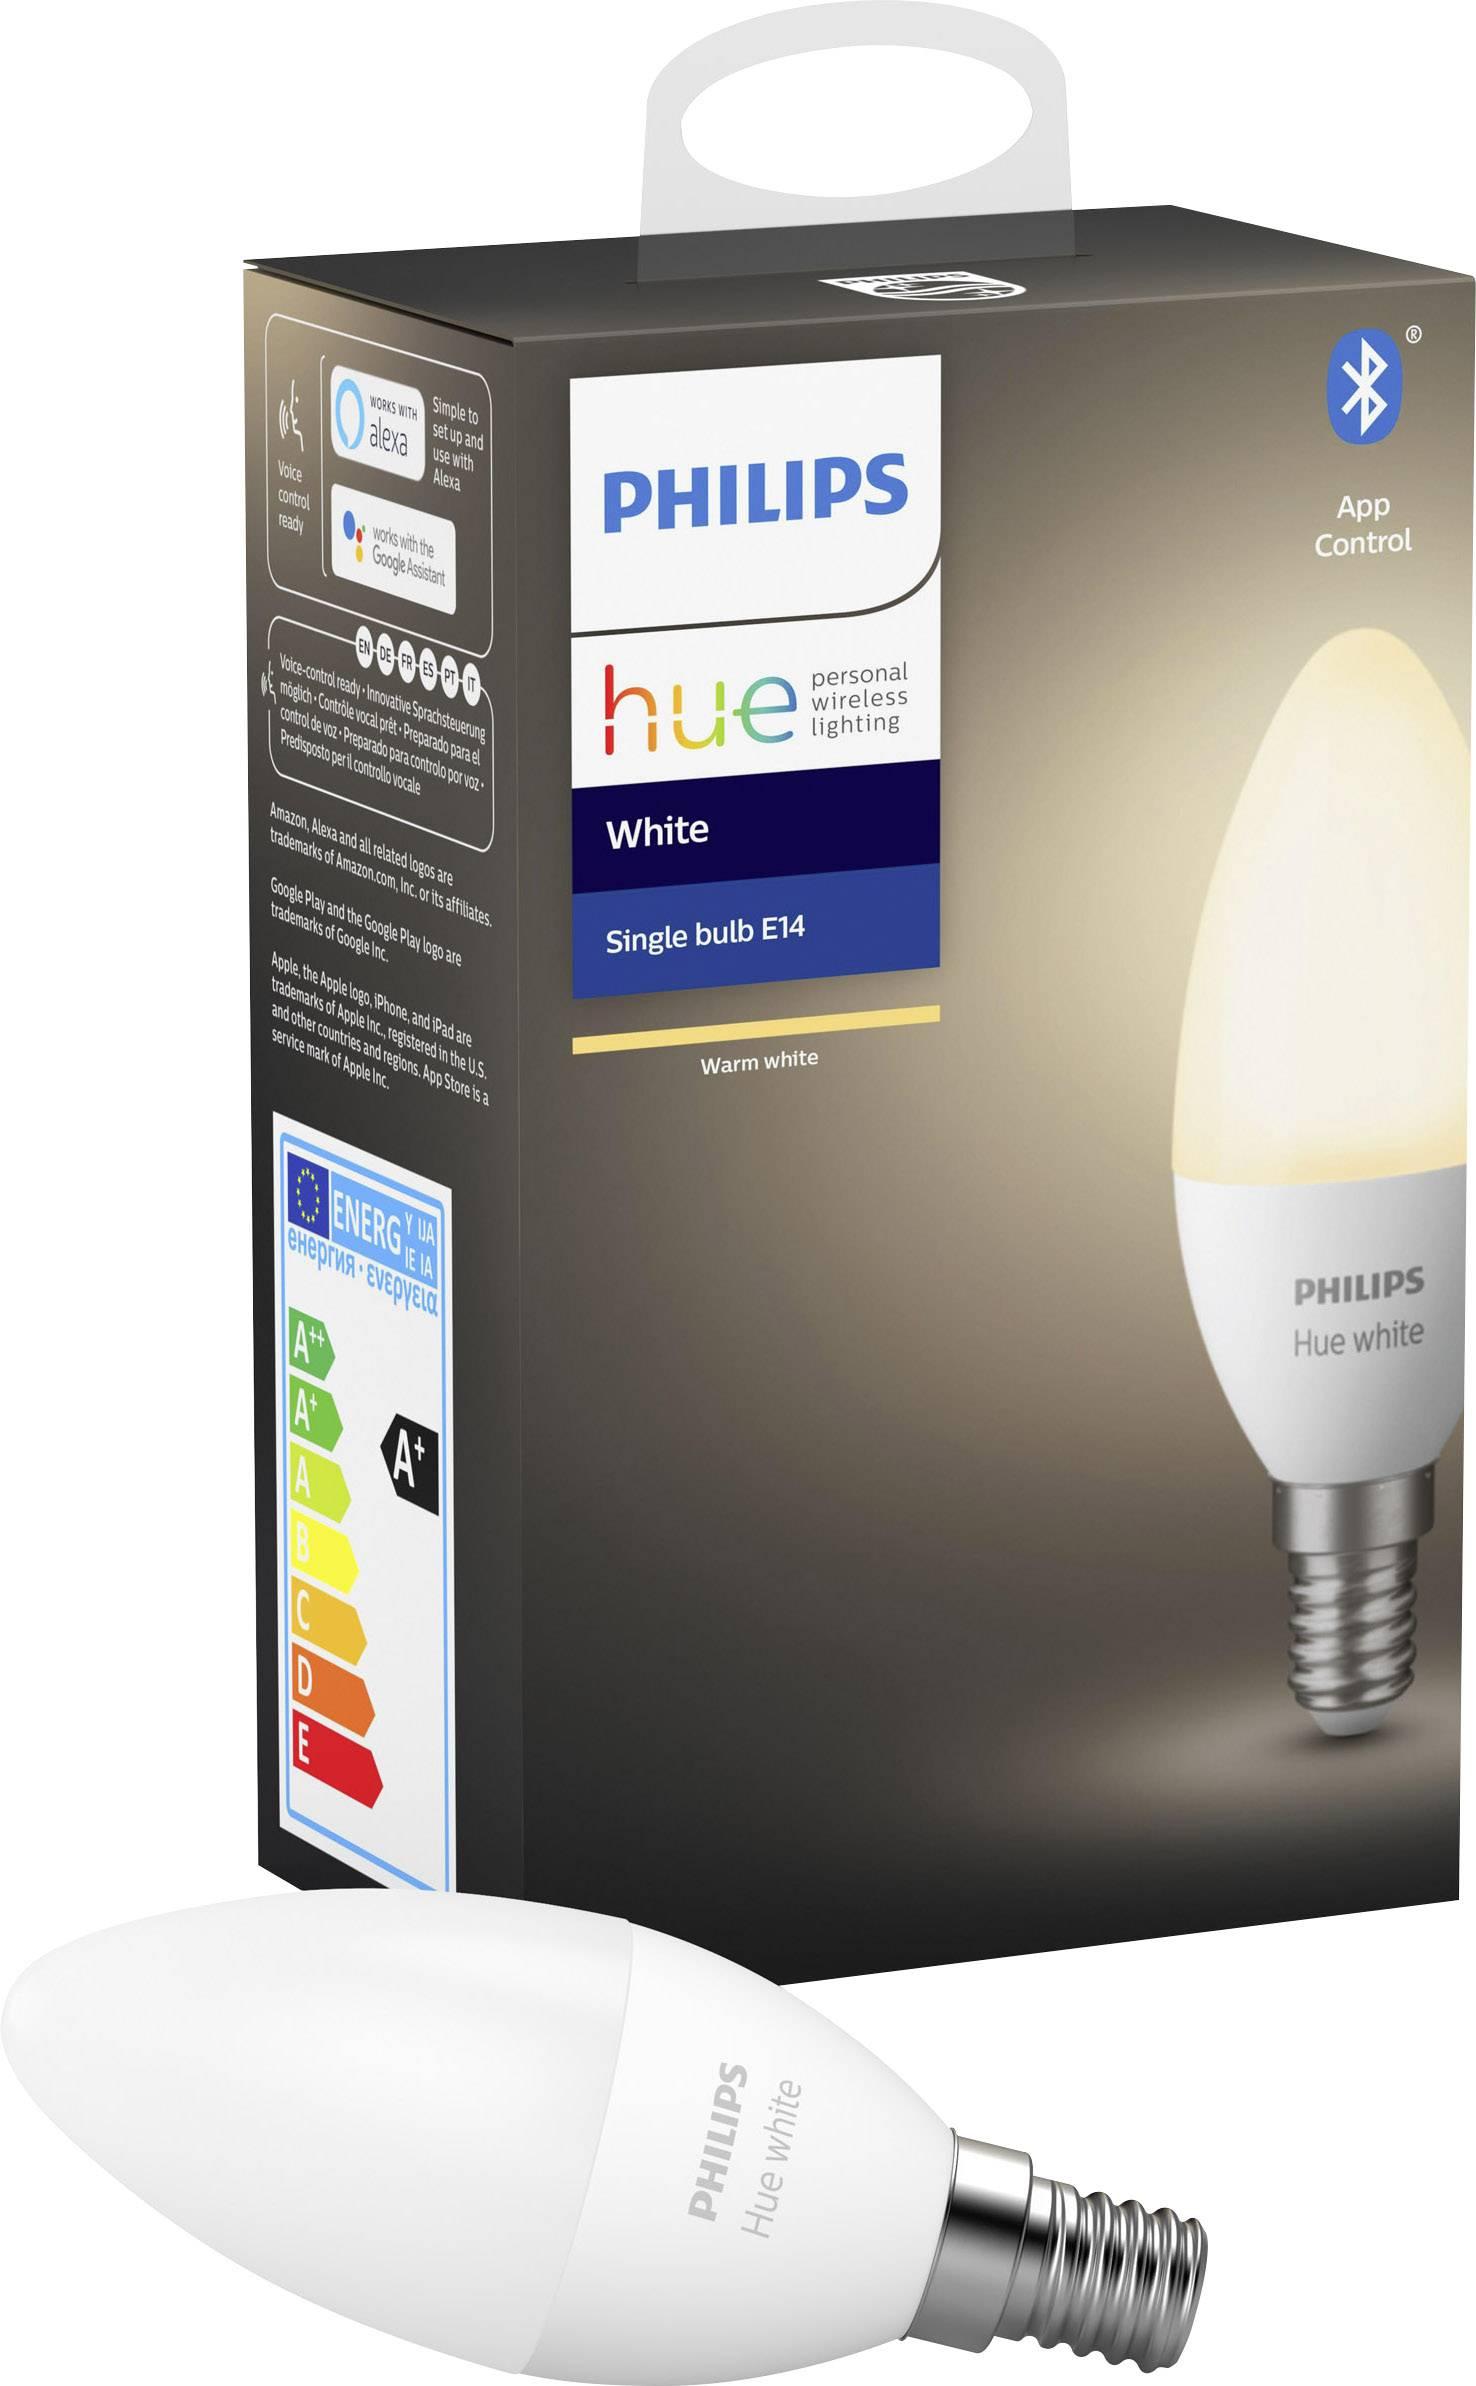 philips lighting hue led light bulb single 929002039901 eec a a e white e14 5 5 w warm white